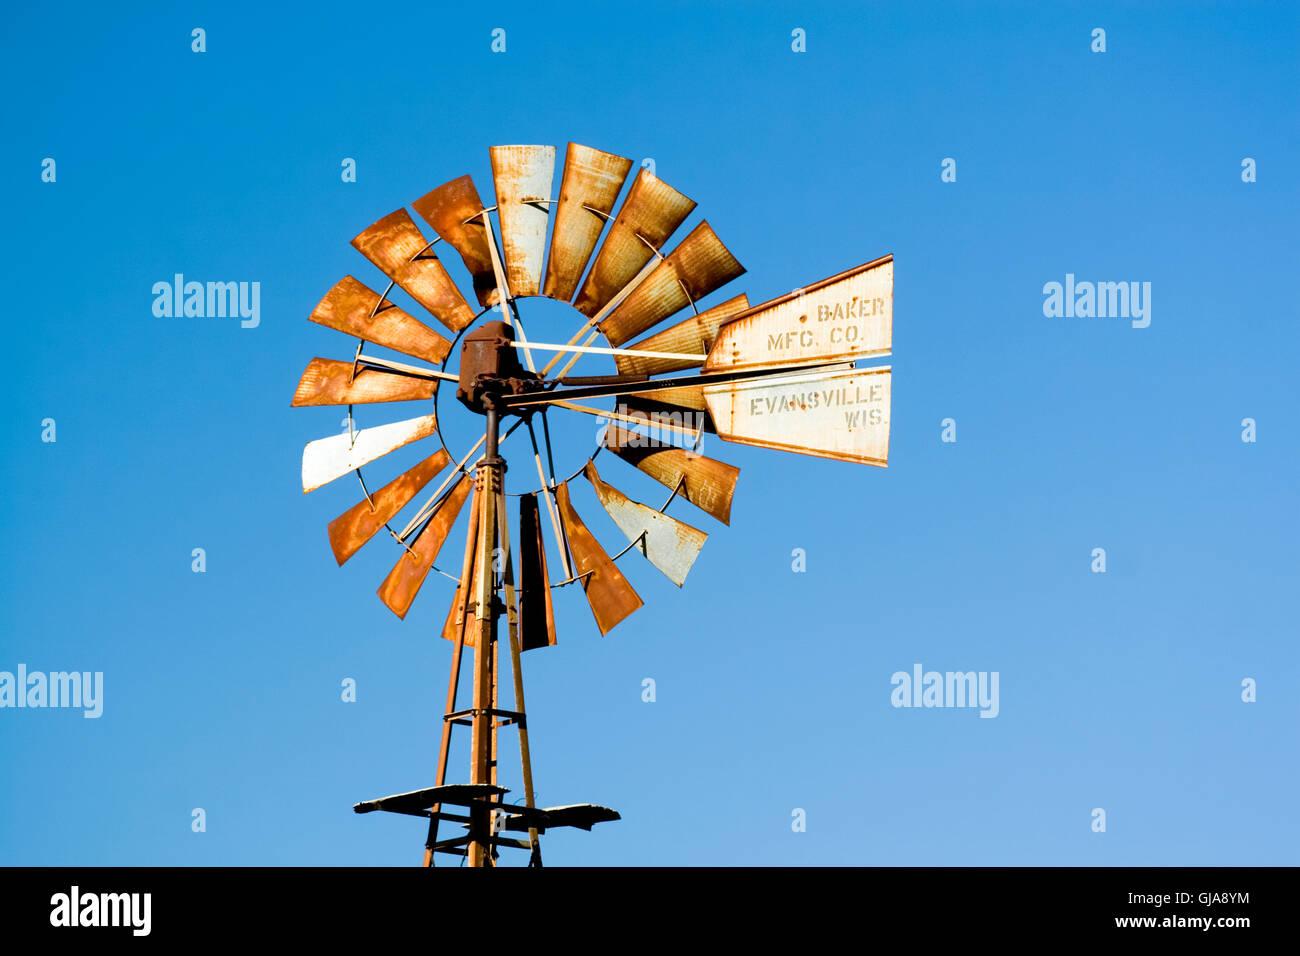 Kansas KS USA, Wind angetriebene Wasserpumpe Stockbild